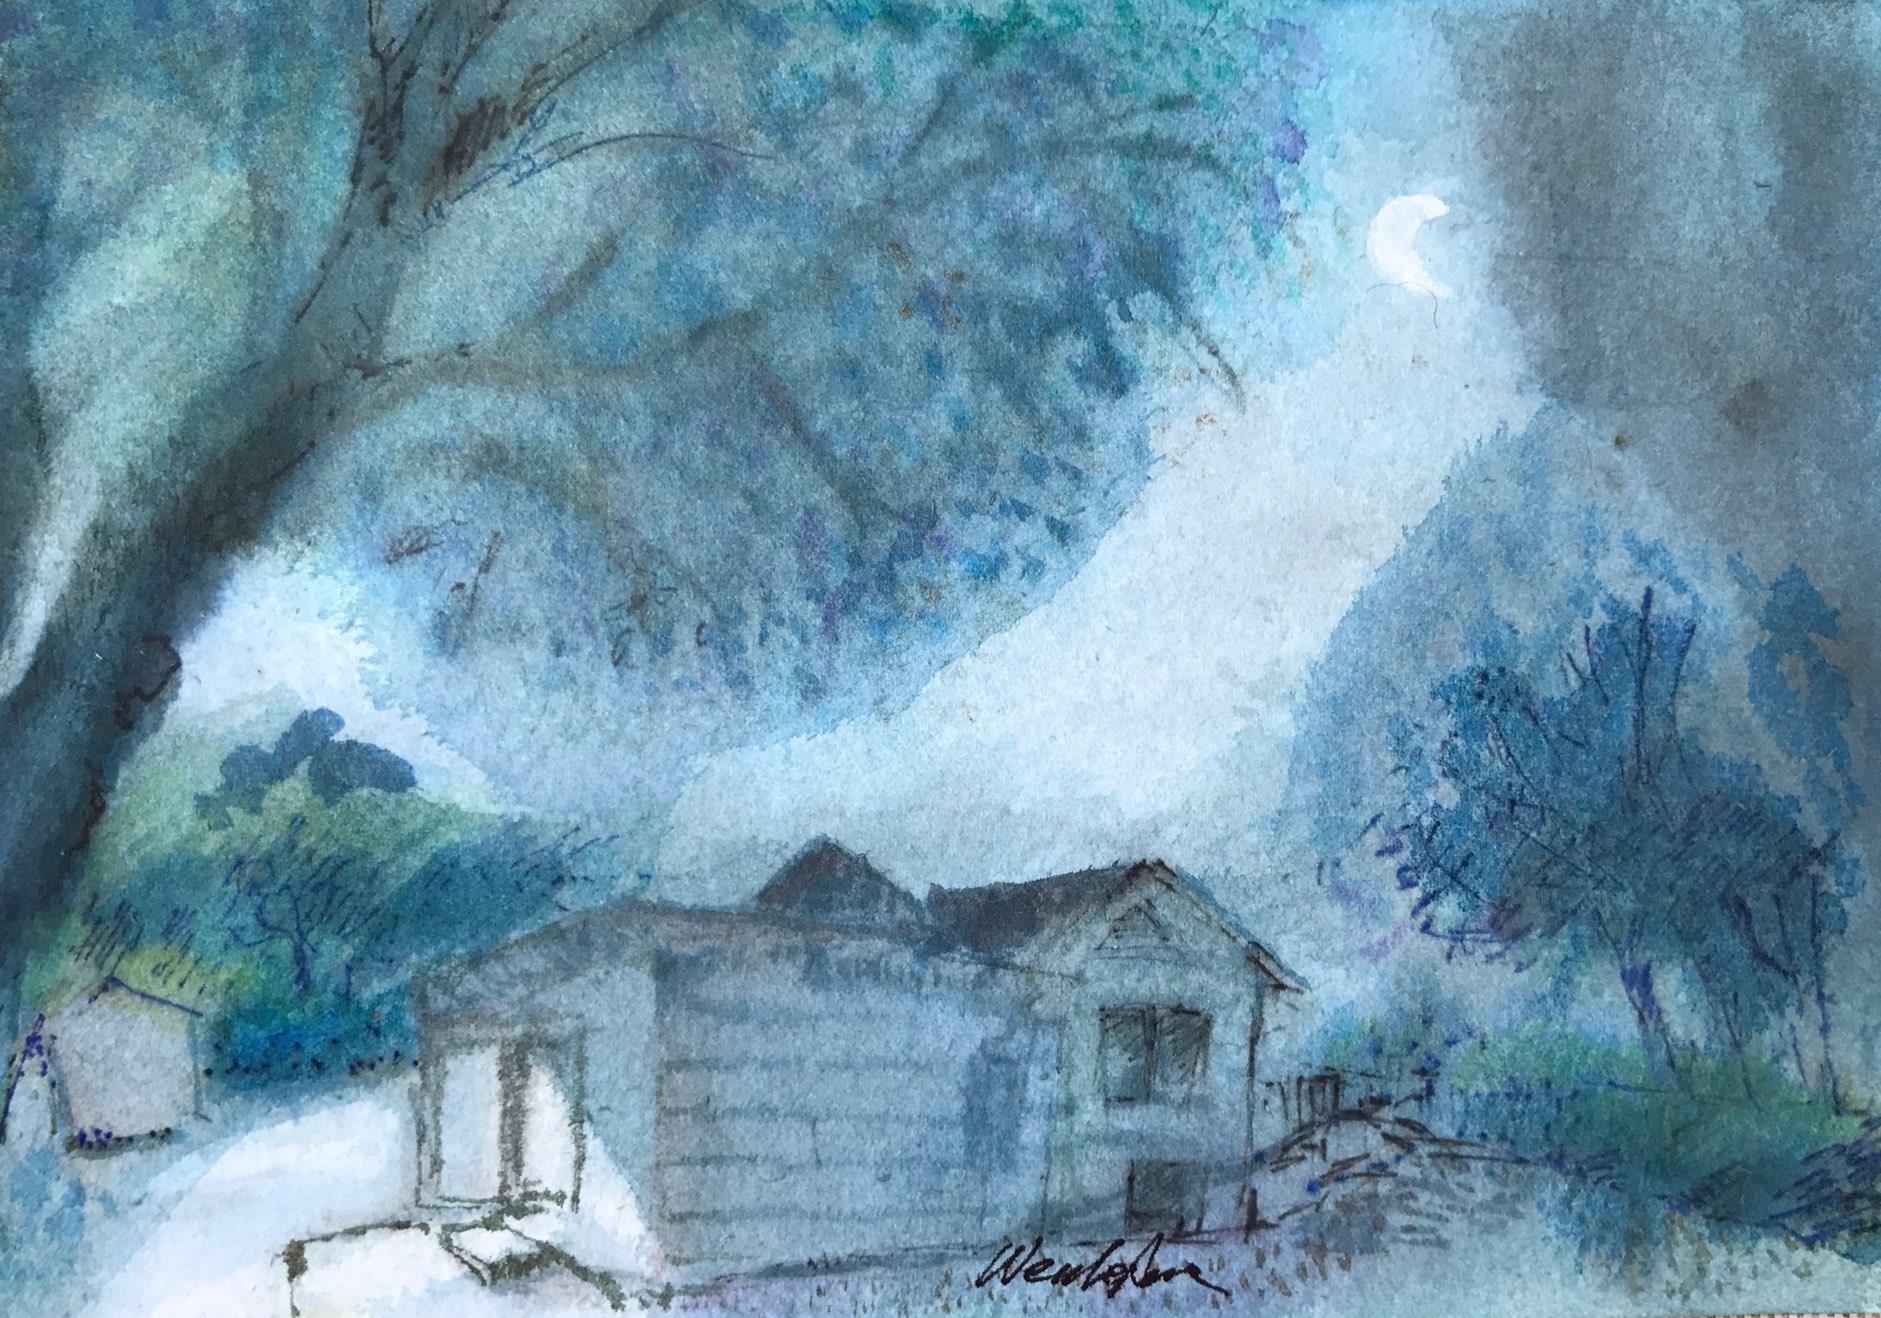 https://0901.nccdn.net/4_2/000/000/011/751/watercolor25-1881x1318.jpg